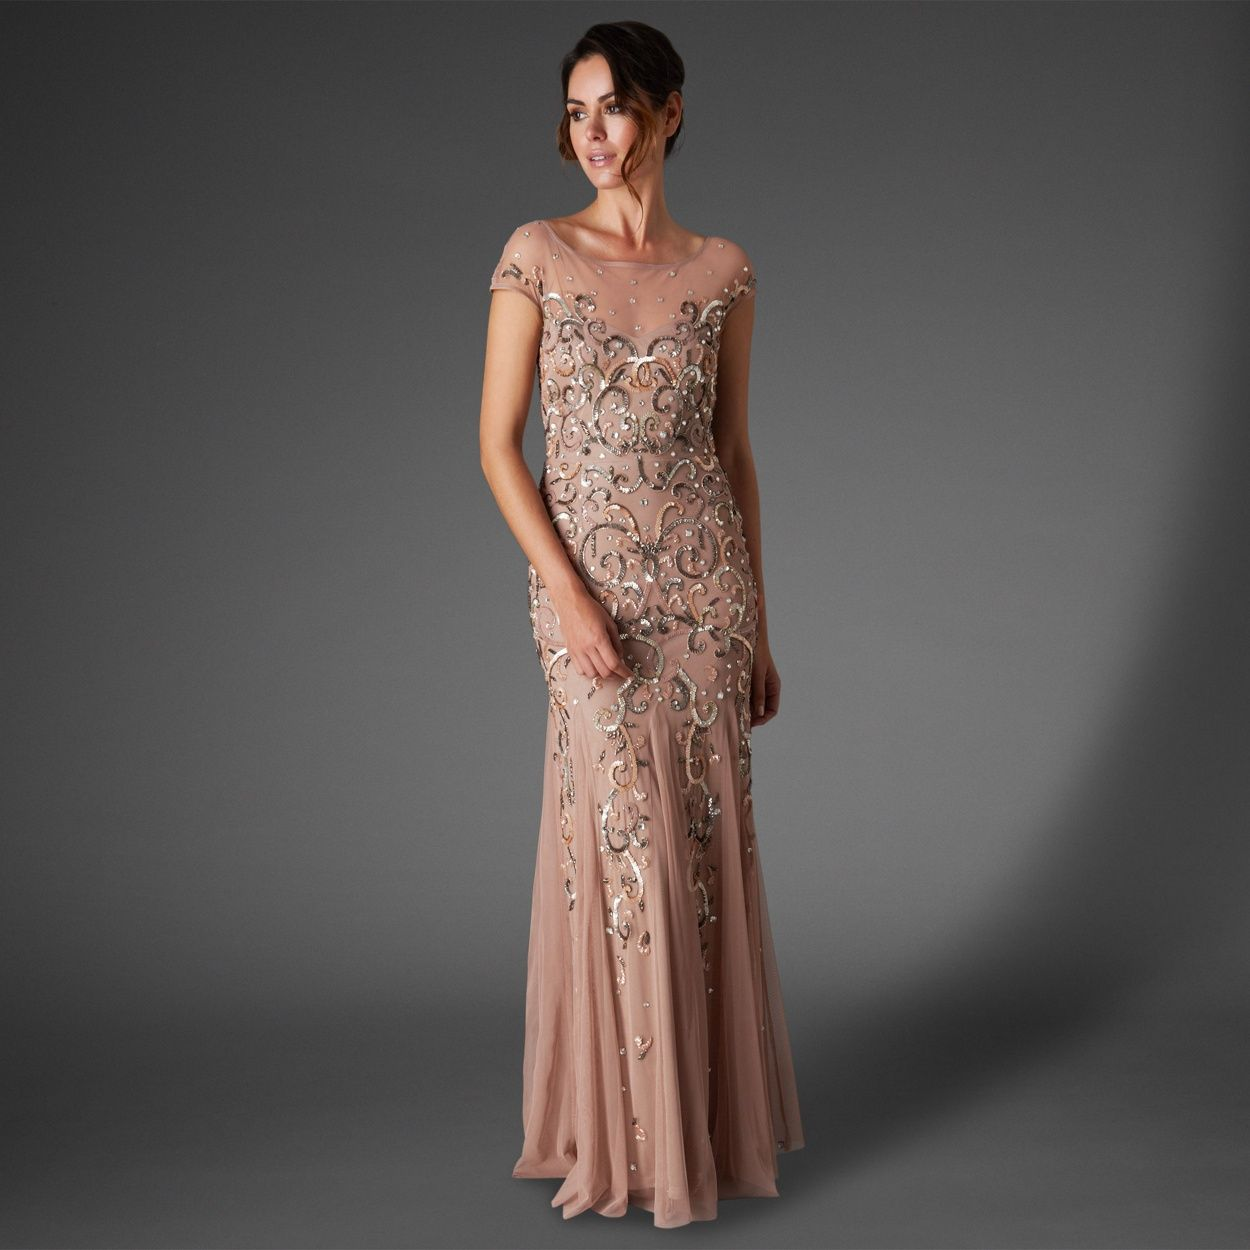 Phase eight blush nina sequin jewelled dress at debenhams phase eight blush nina sequin jewelled dress at debenhams full length dressesdebenhamsbridal ombrellifo Gallery